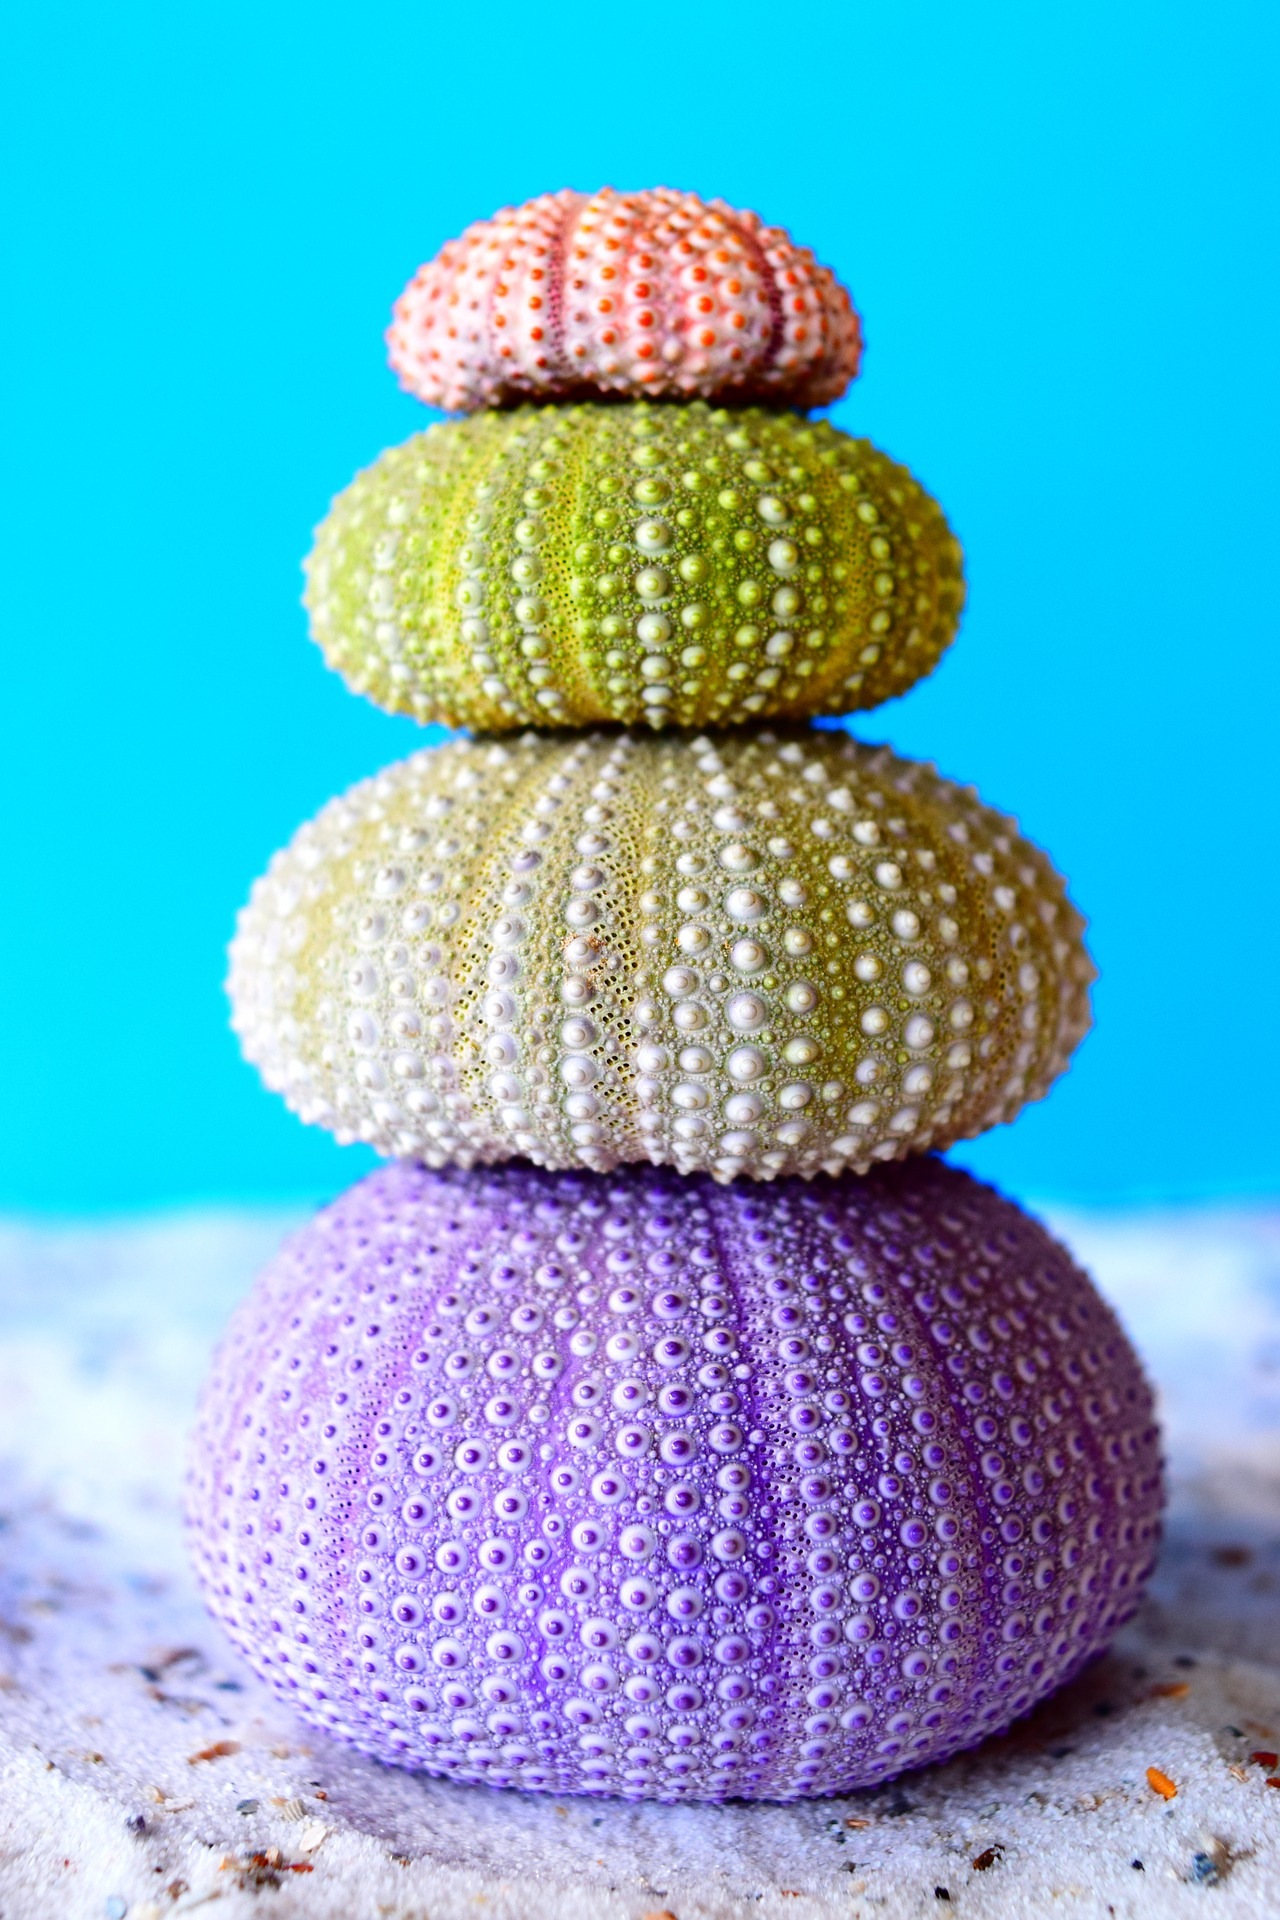 sea-urchins-663508_1920